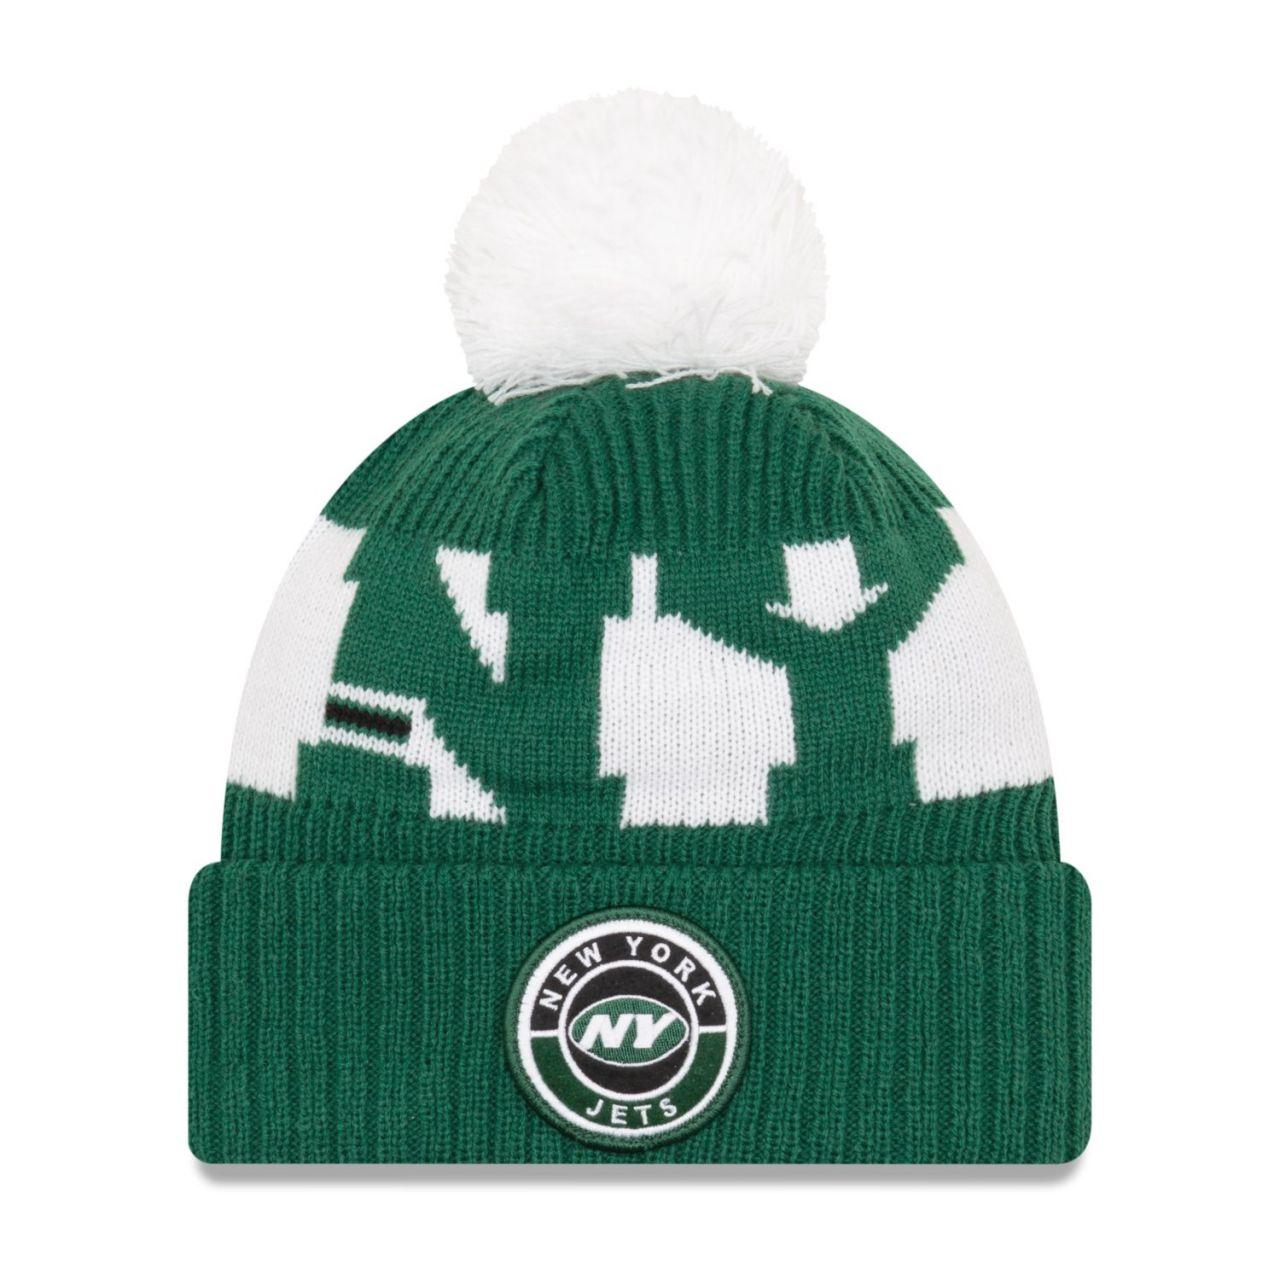 amfoo - New Era NFL ON-FIELD Sideline Kinder Mütze New York Jets